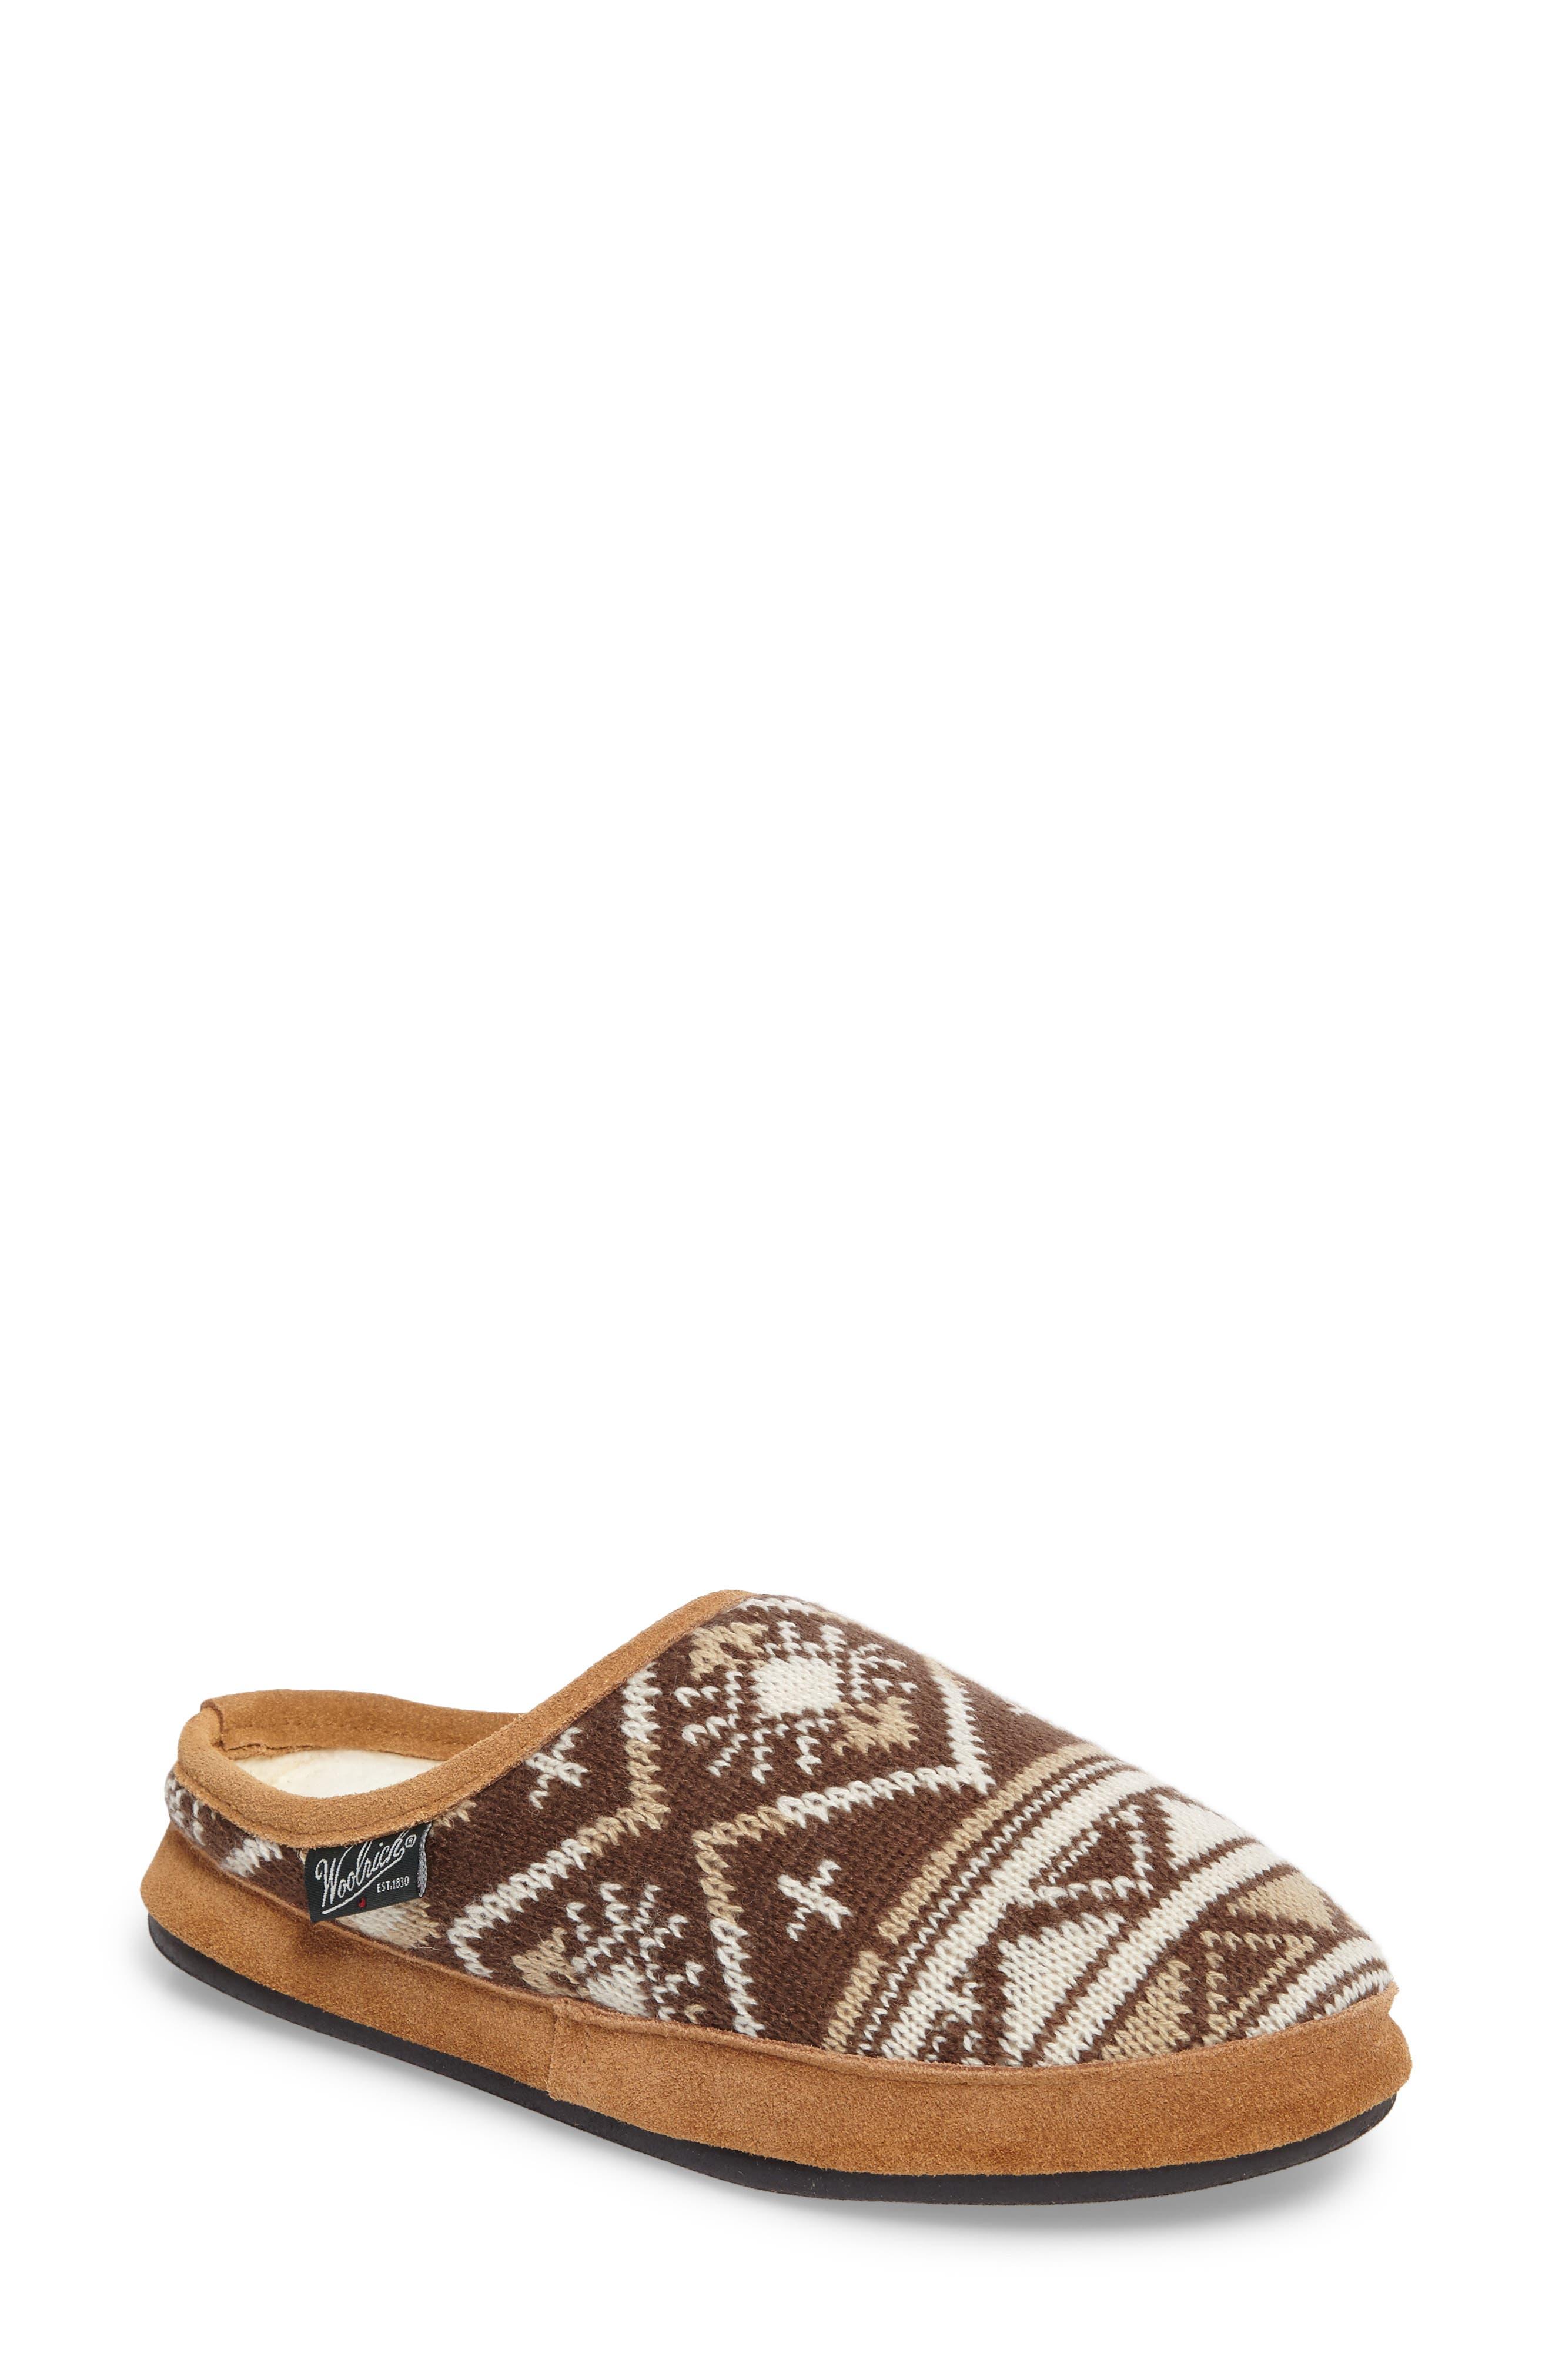 Whitecap Knit Slipper, Main, color, 235